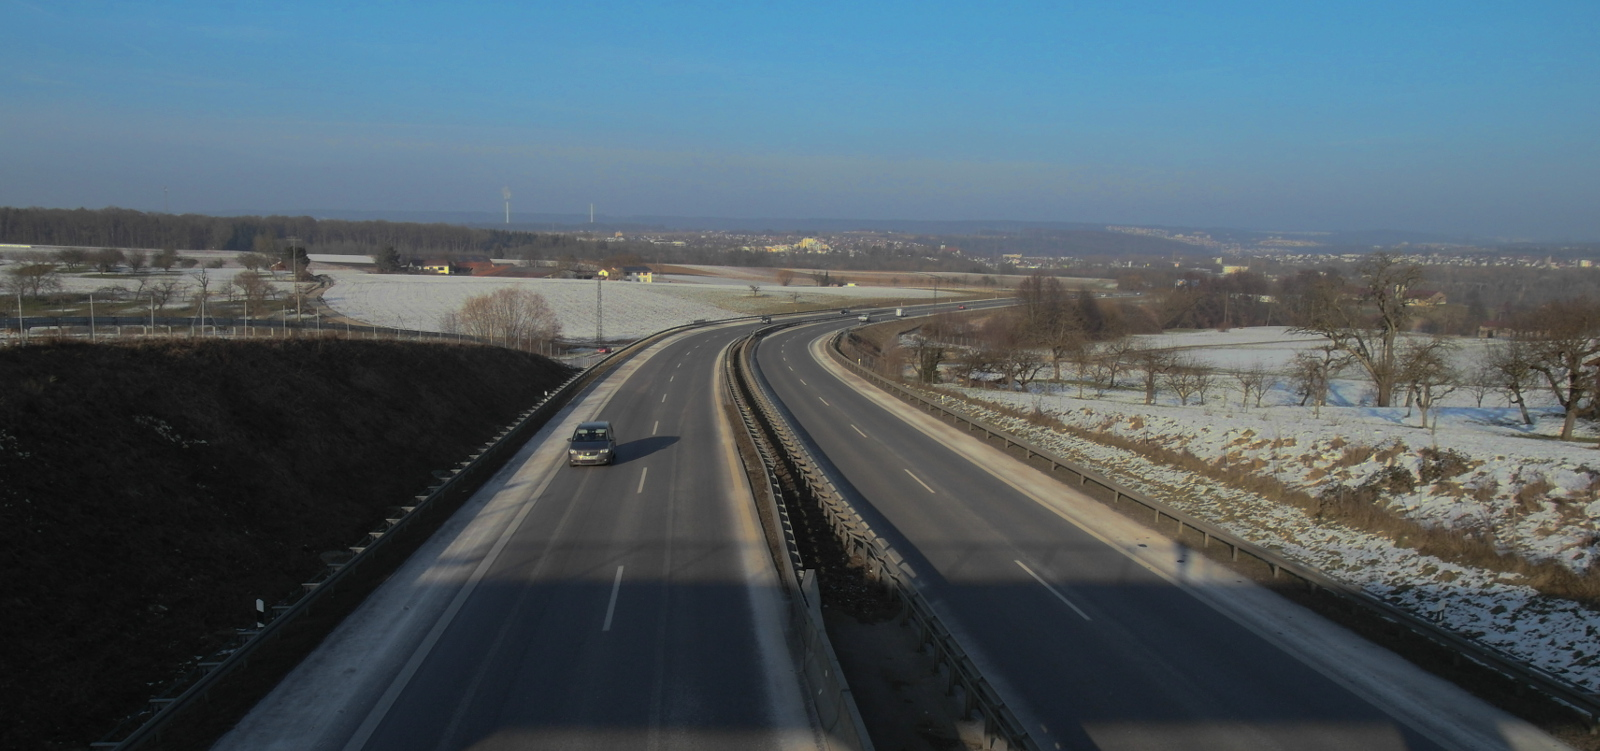 Verkehrsfluss statt Tempolimits